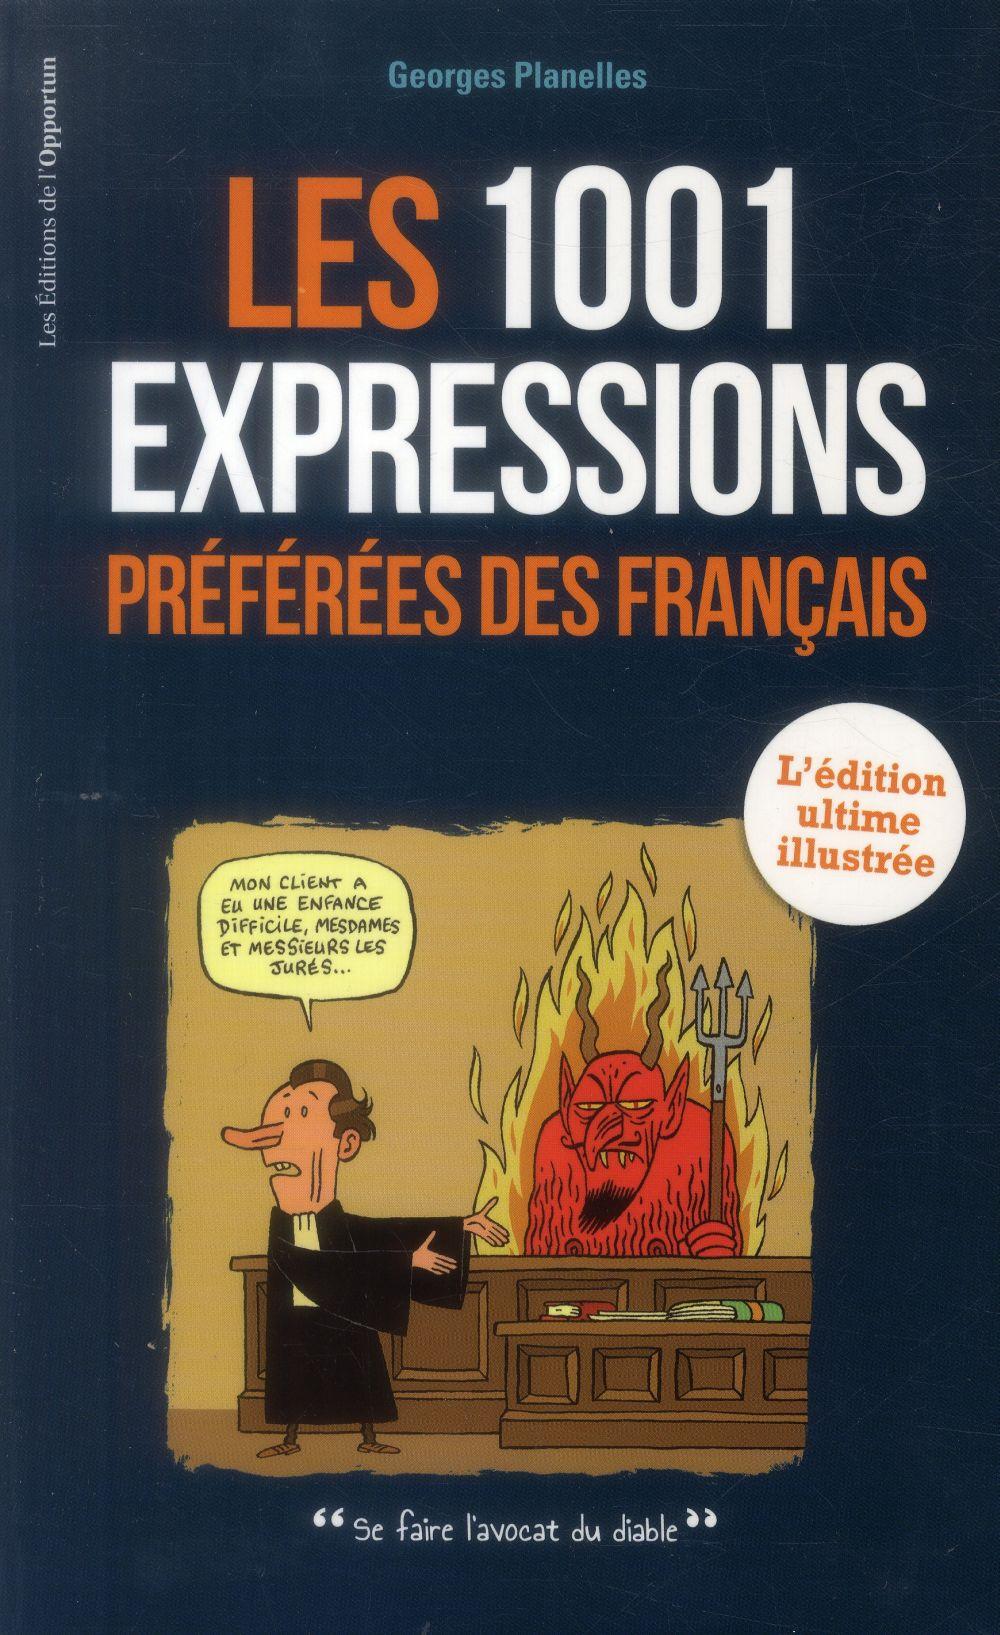 1001 EXPRESSIONS PREFEREES DES FRANCAIS  -  L'EDITION ULTIME ILLUSTREE PLANELLES GEORGES l'Opportun